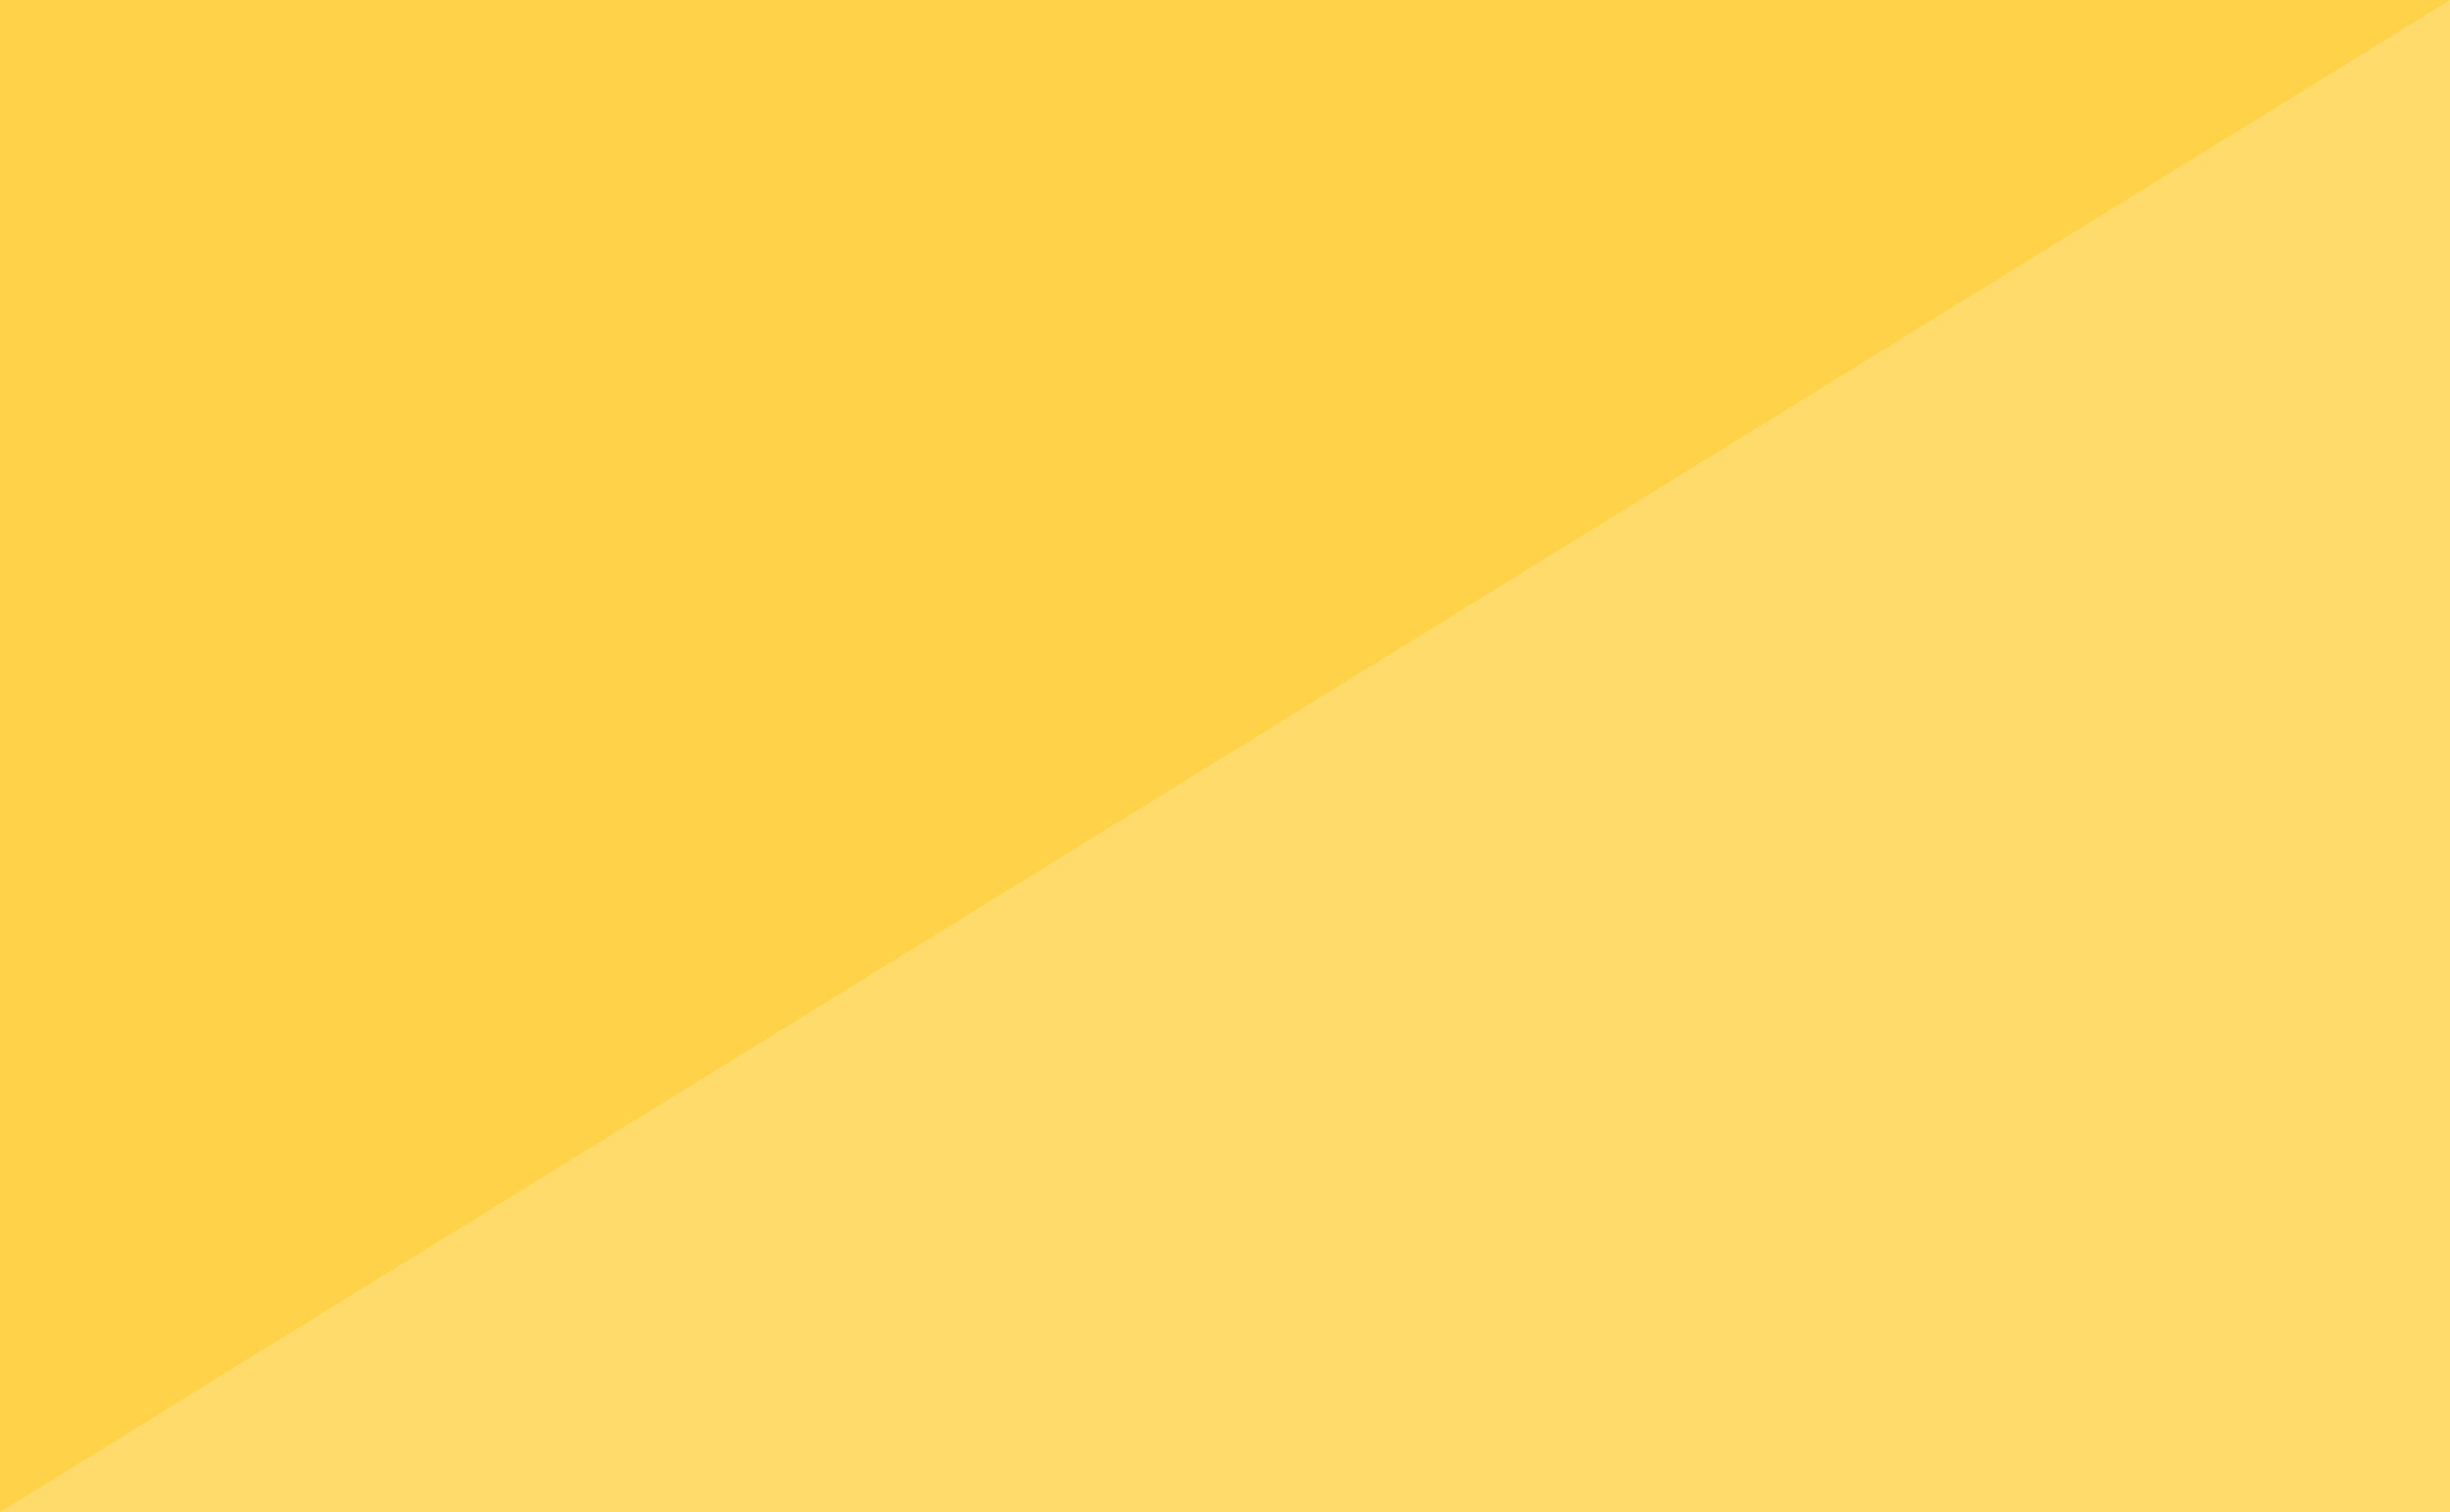 koc 合作平台背景圖